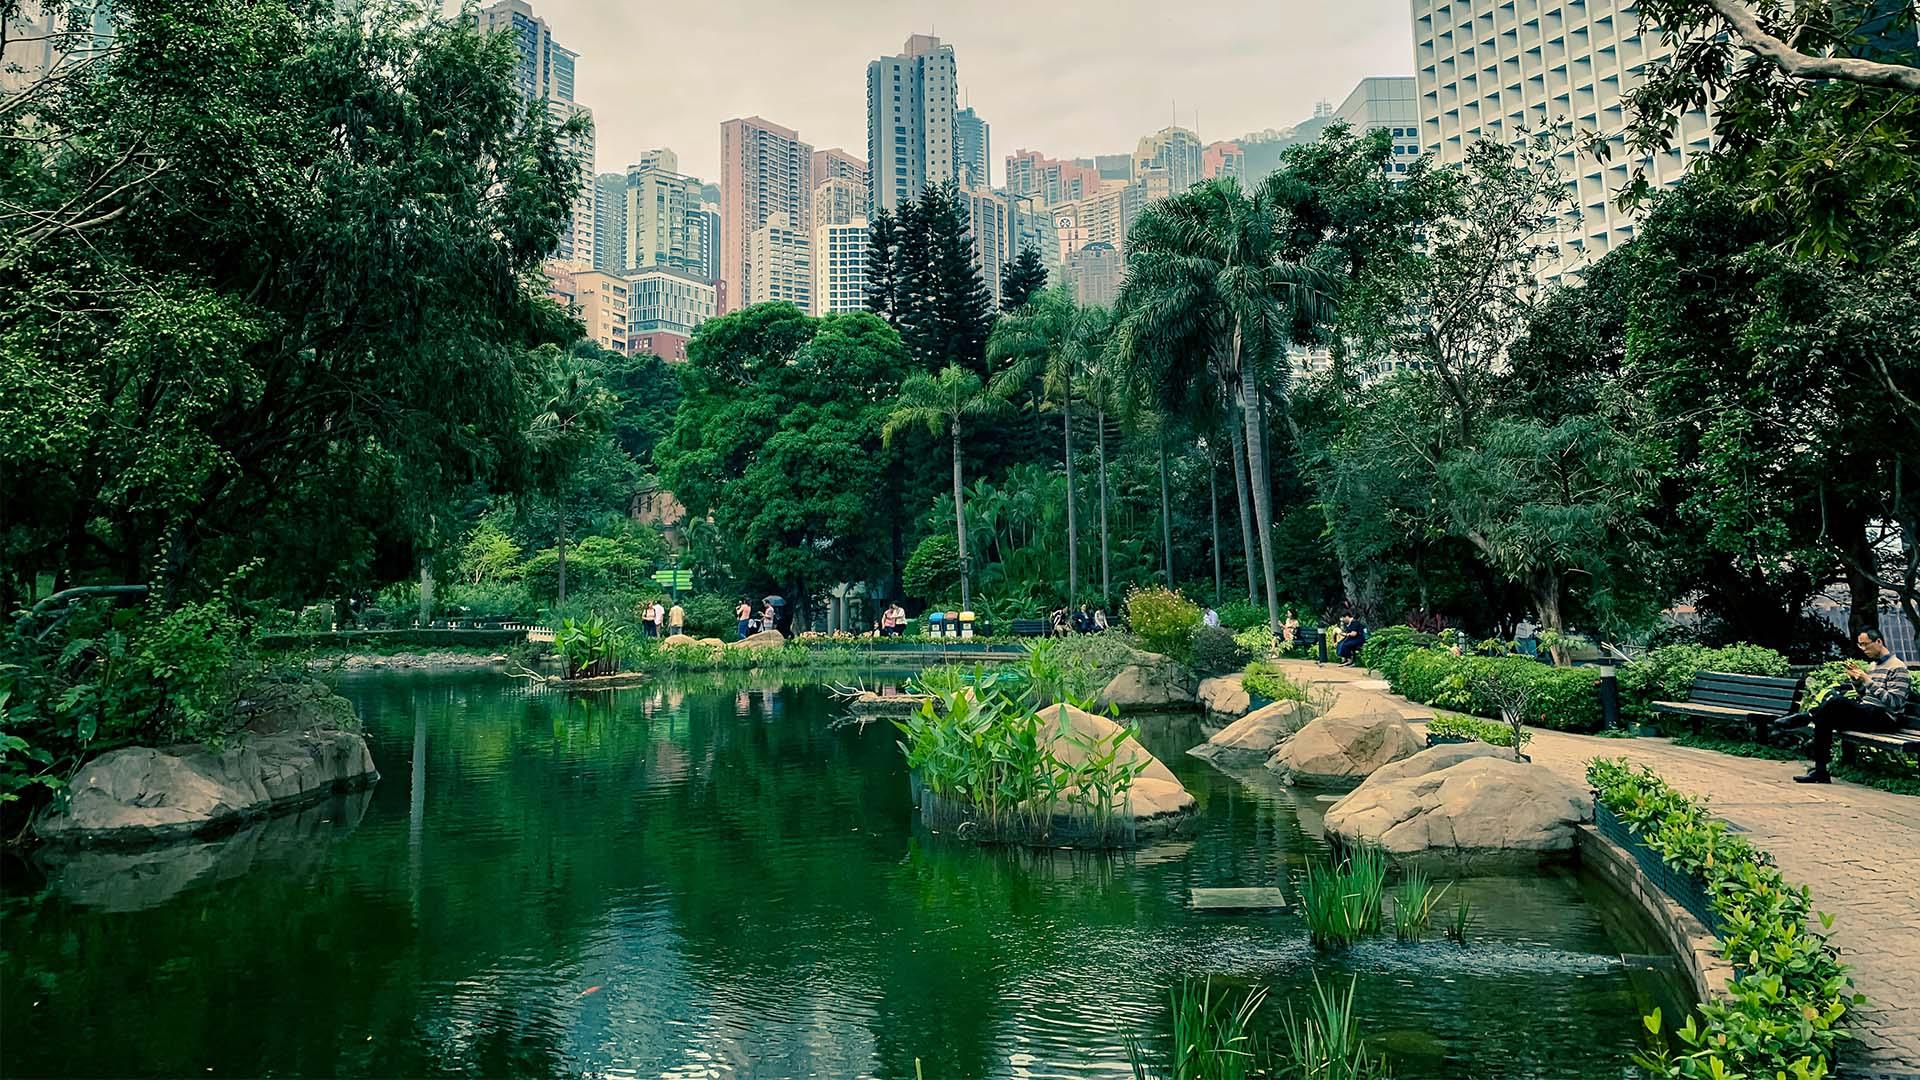 Seeking out green spaces in Hong Kong